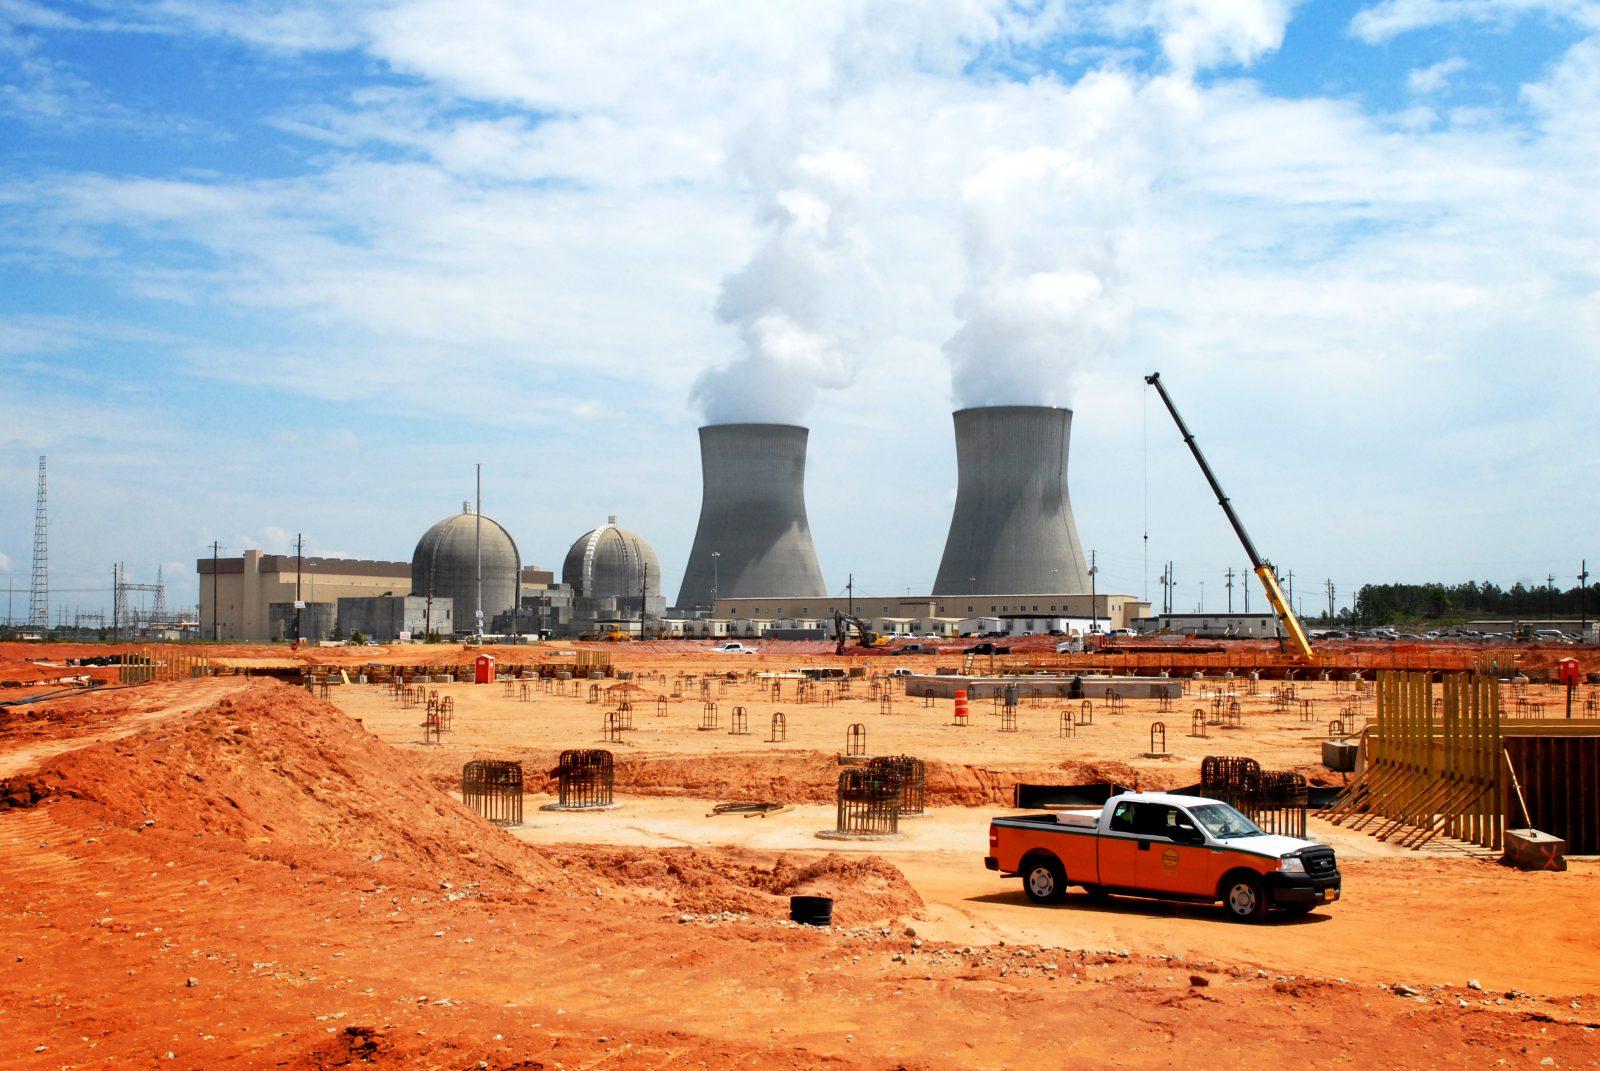 Renaissance der Kernkraft